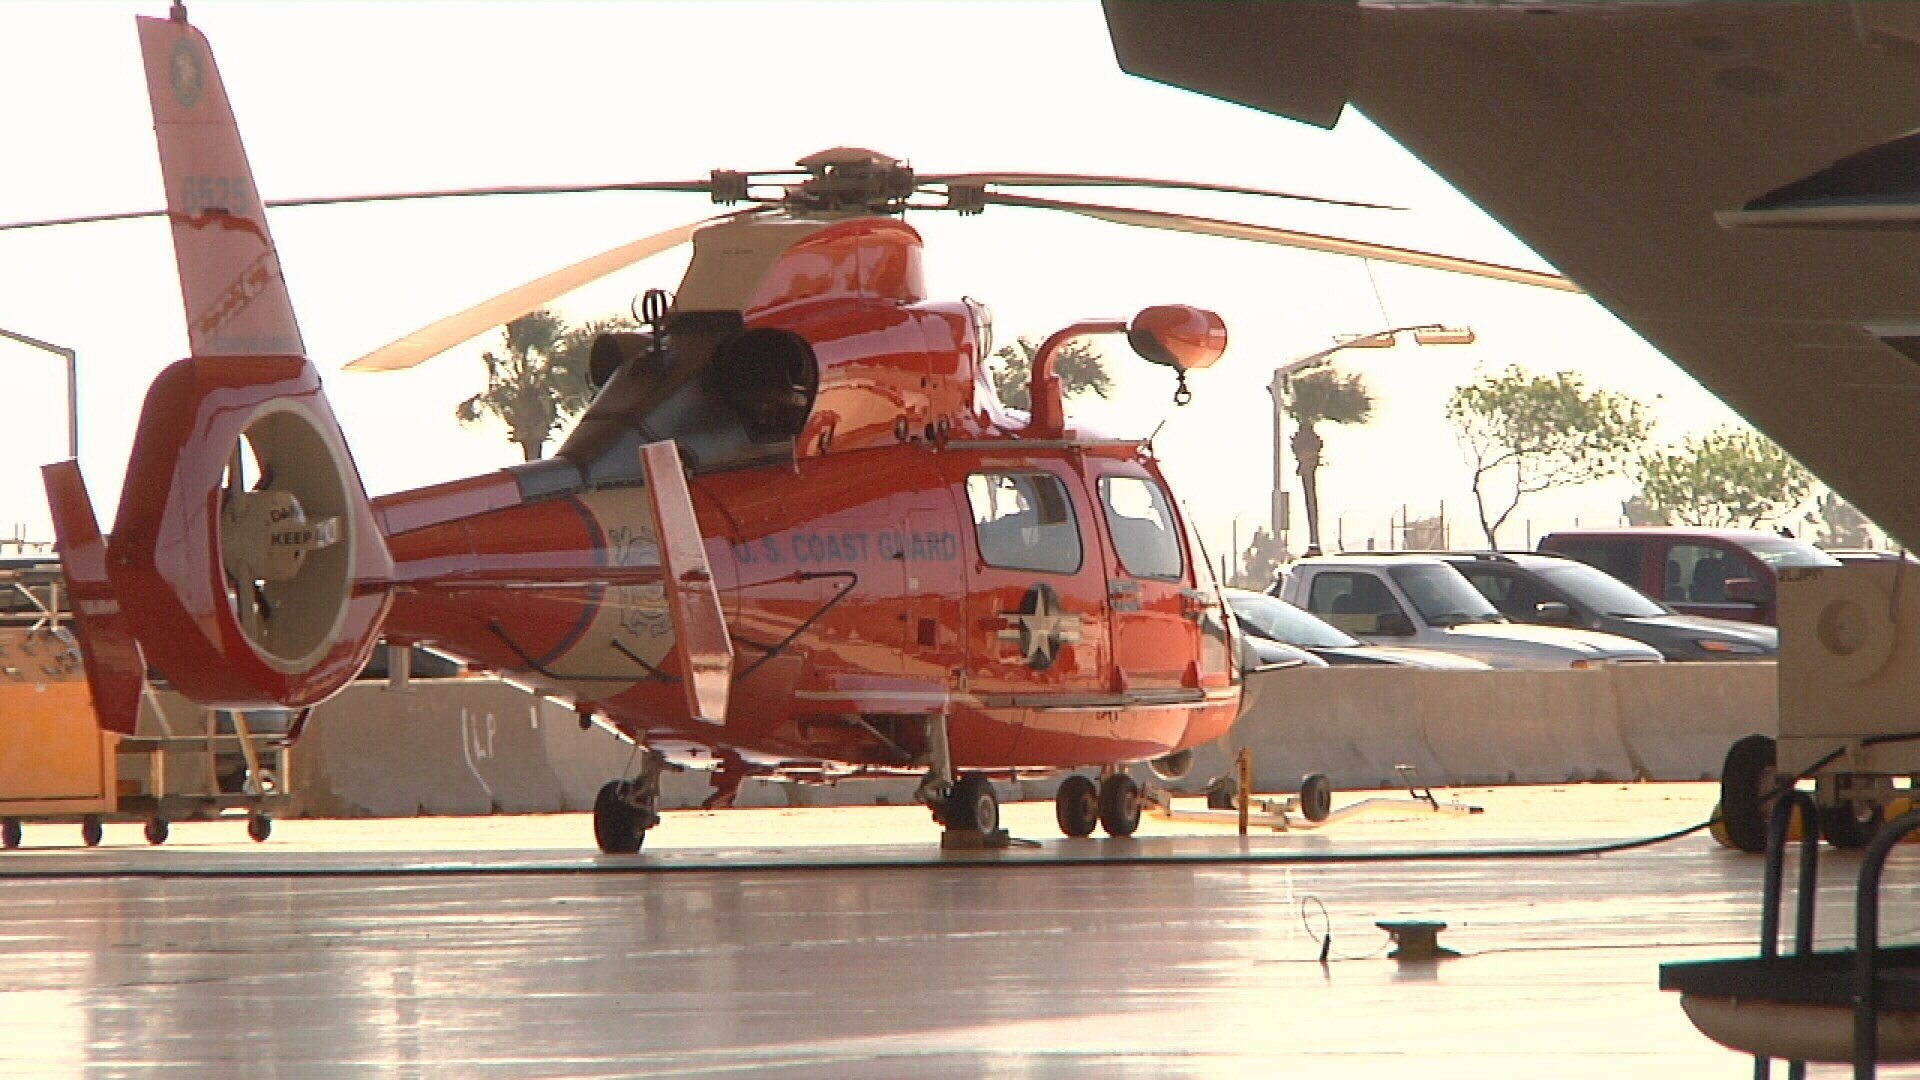 Spring break kicks off the busiest season of the year for Coast Guard Sector Corpus Christi